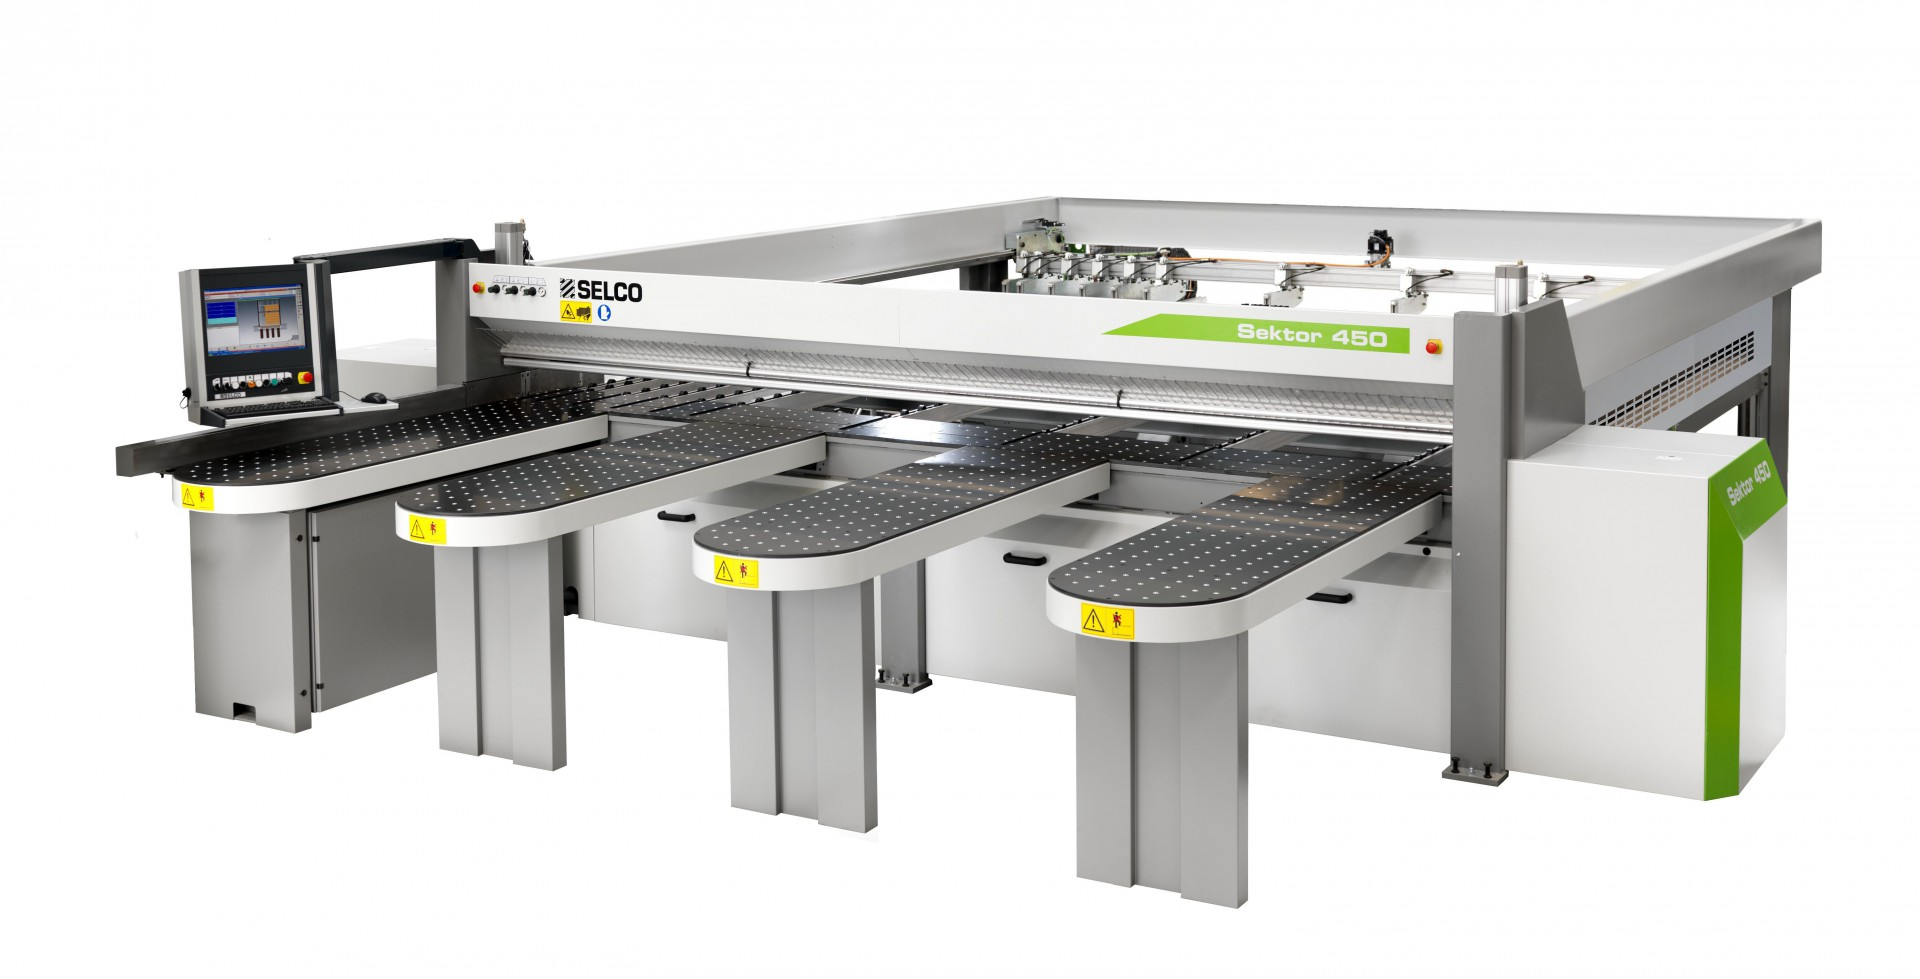 Sektor 450 - pilarka formatowa. Producent: Biesse. Dystrybutor: Teknika. Fot. Teknika